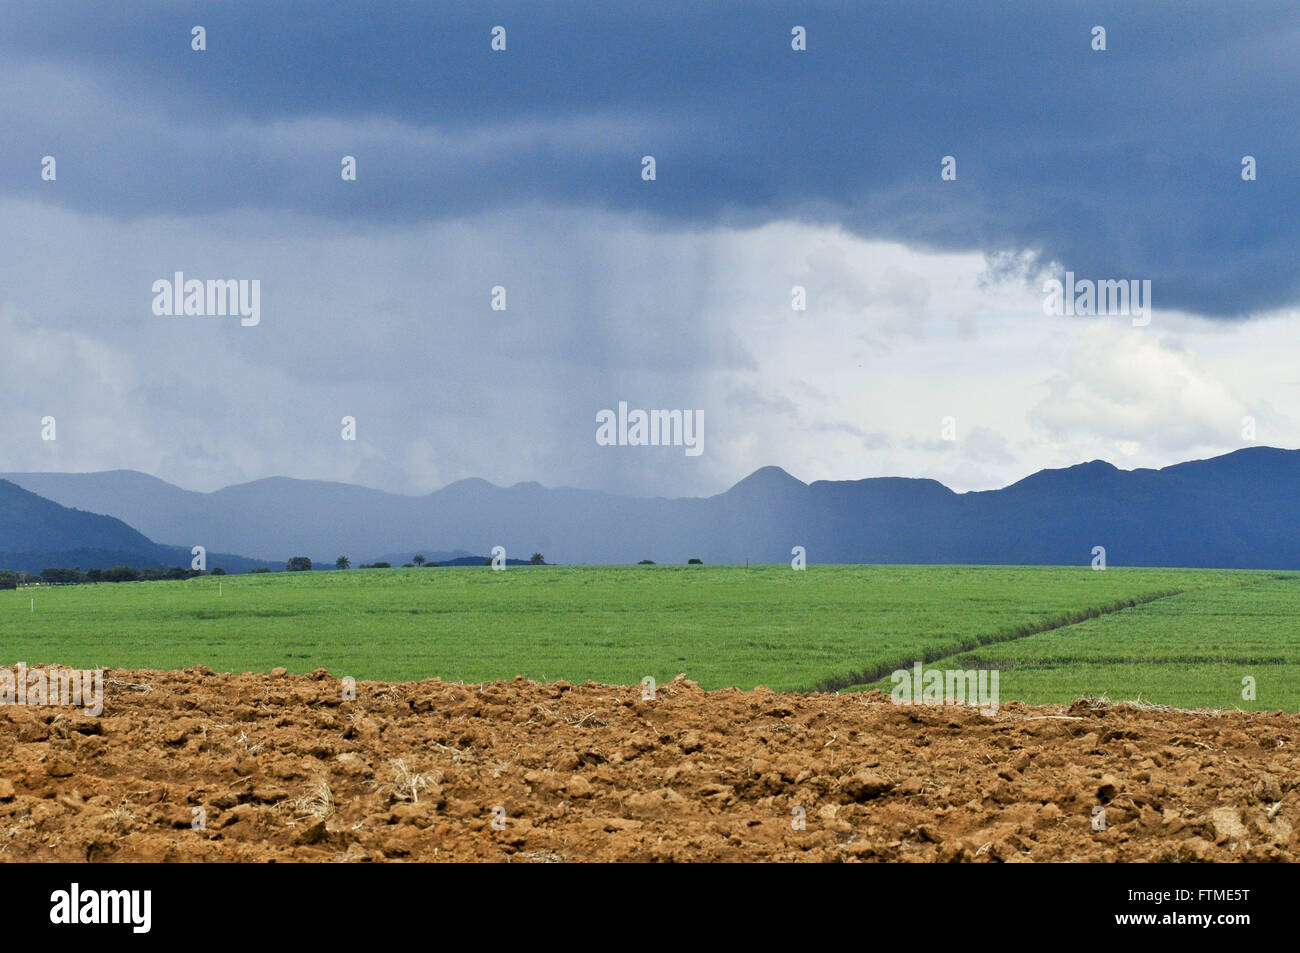 Precipitation of rain in the countryside with plantation of cane sugar and Serra da Canastra Incidental - Stock Image